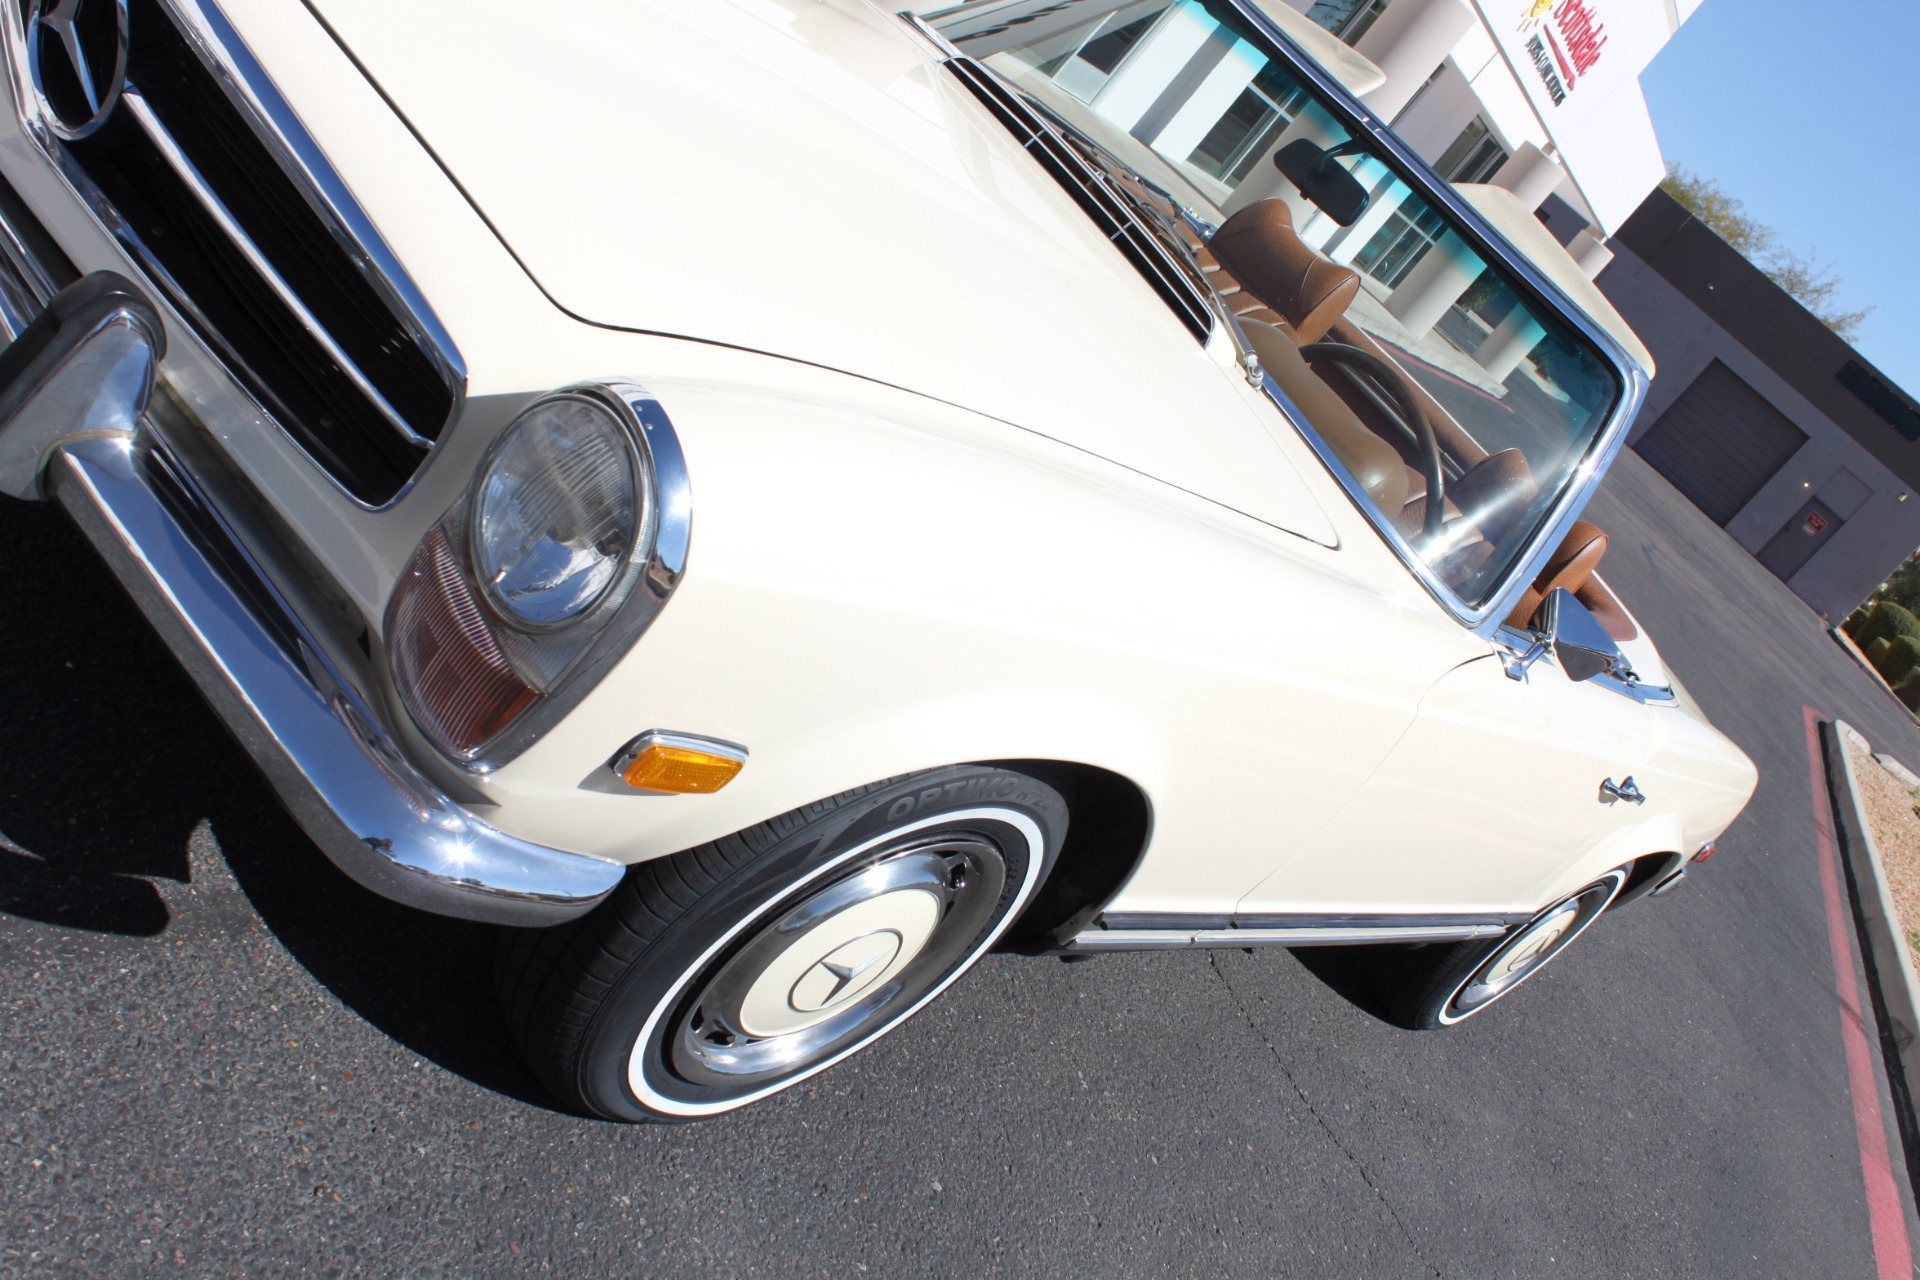 Used-1971-Mercedes-Benz-280SL-Convertible-Mopar